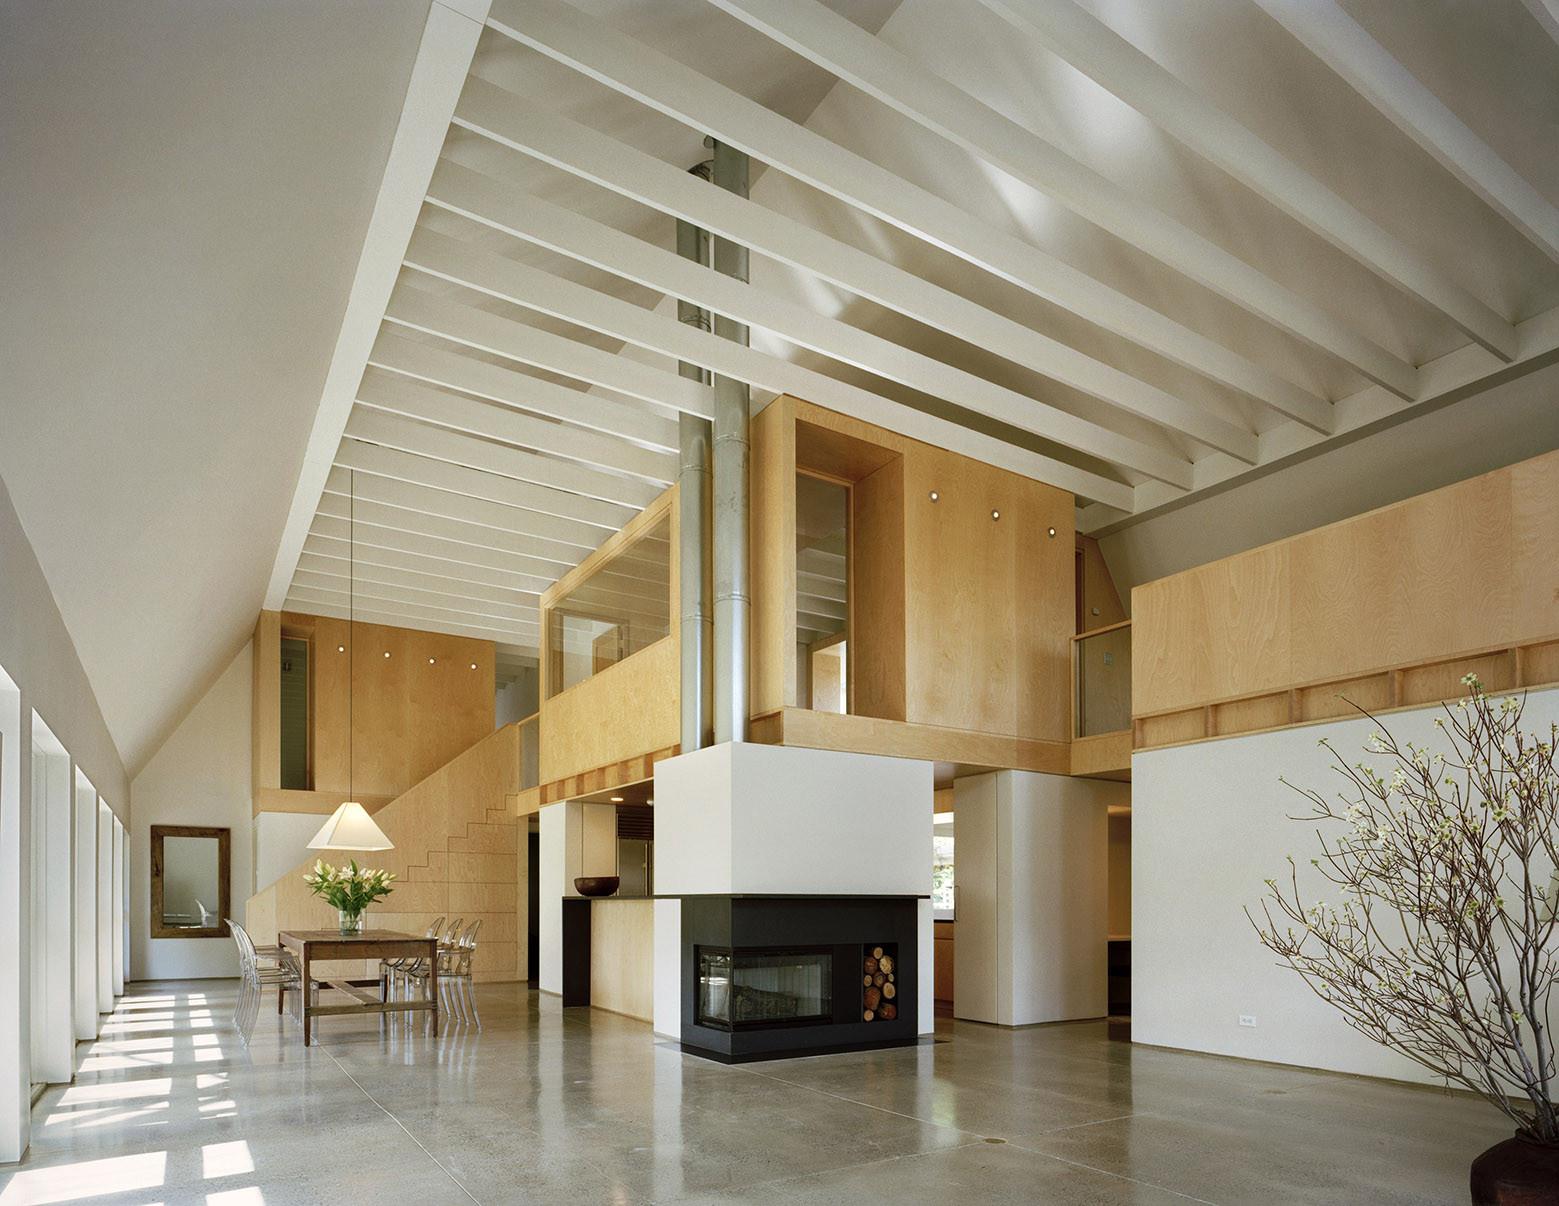 gallery of modern barn specht harpman 4. Black Bedroom Furniture Sets. Home Design Ideas